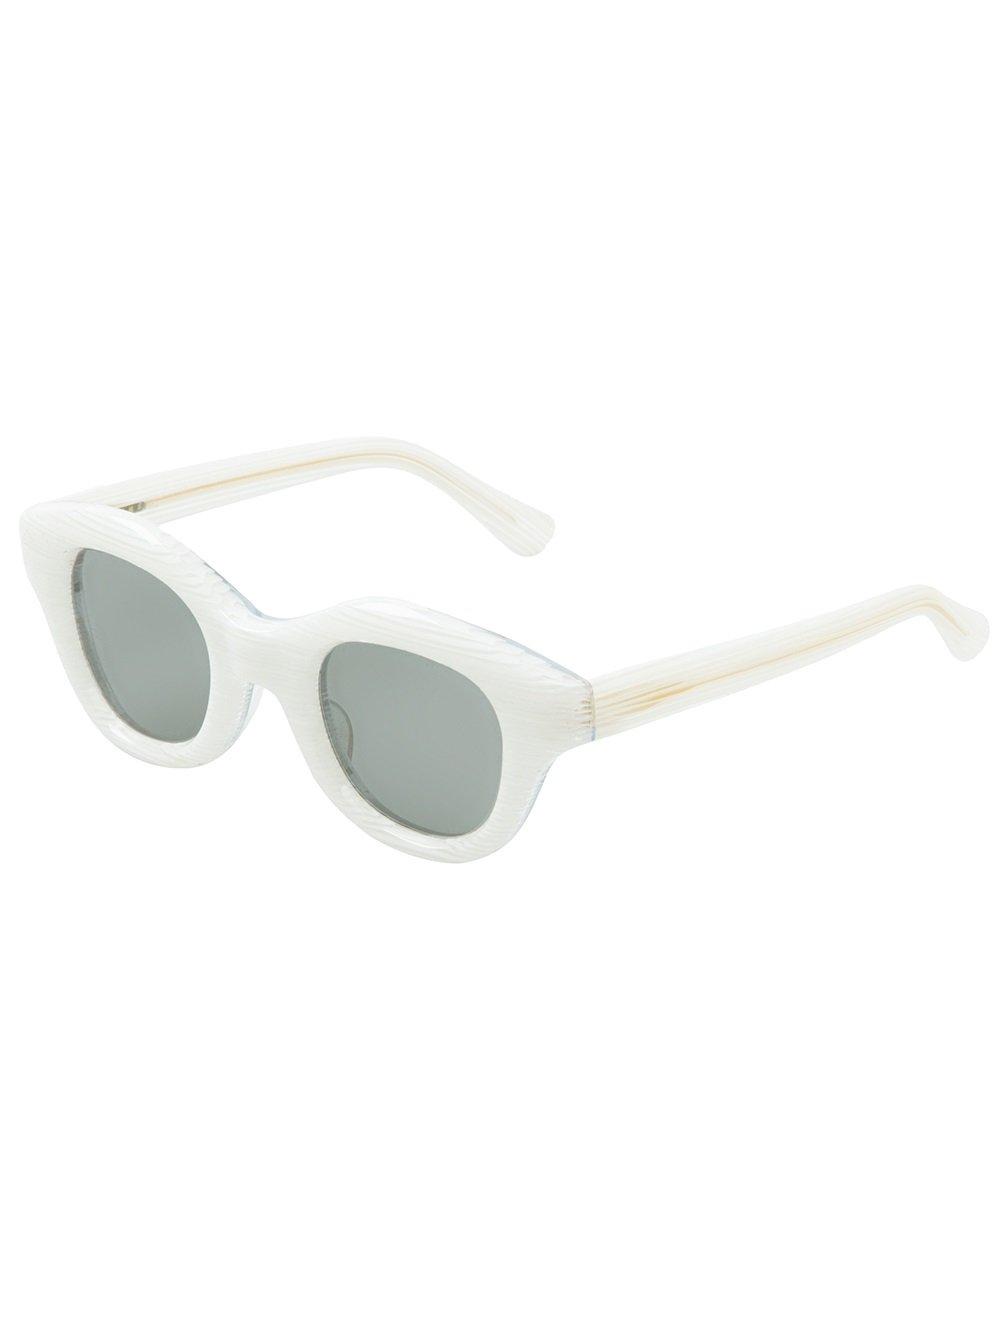 Hakusan Hook Sunglasses in White